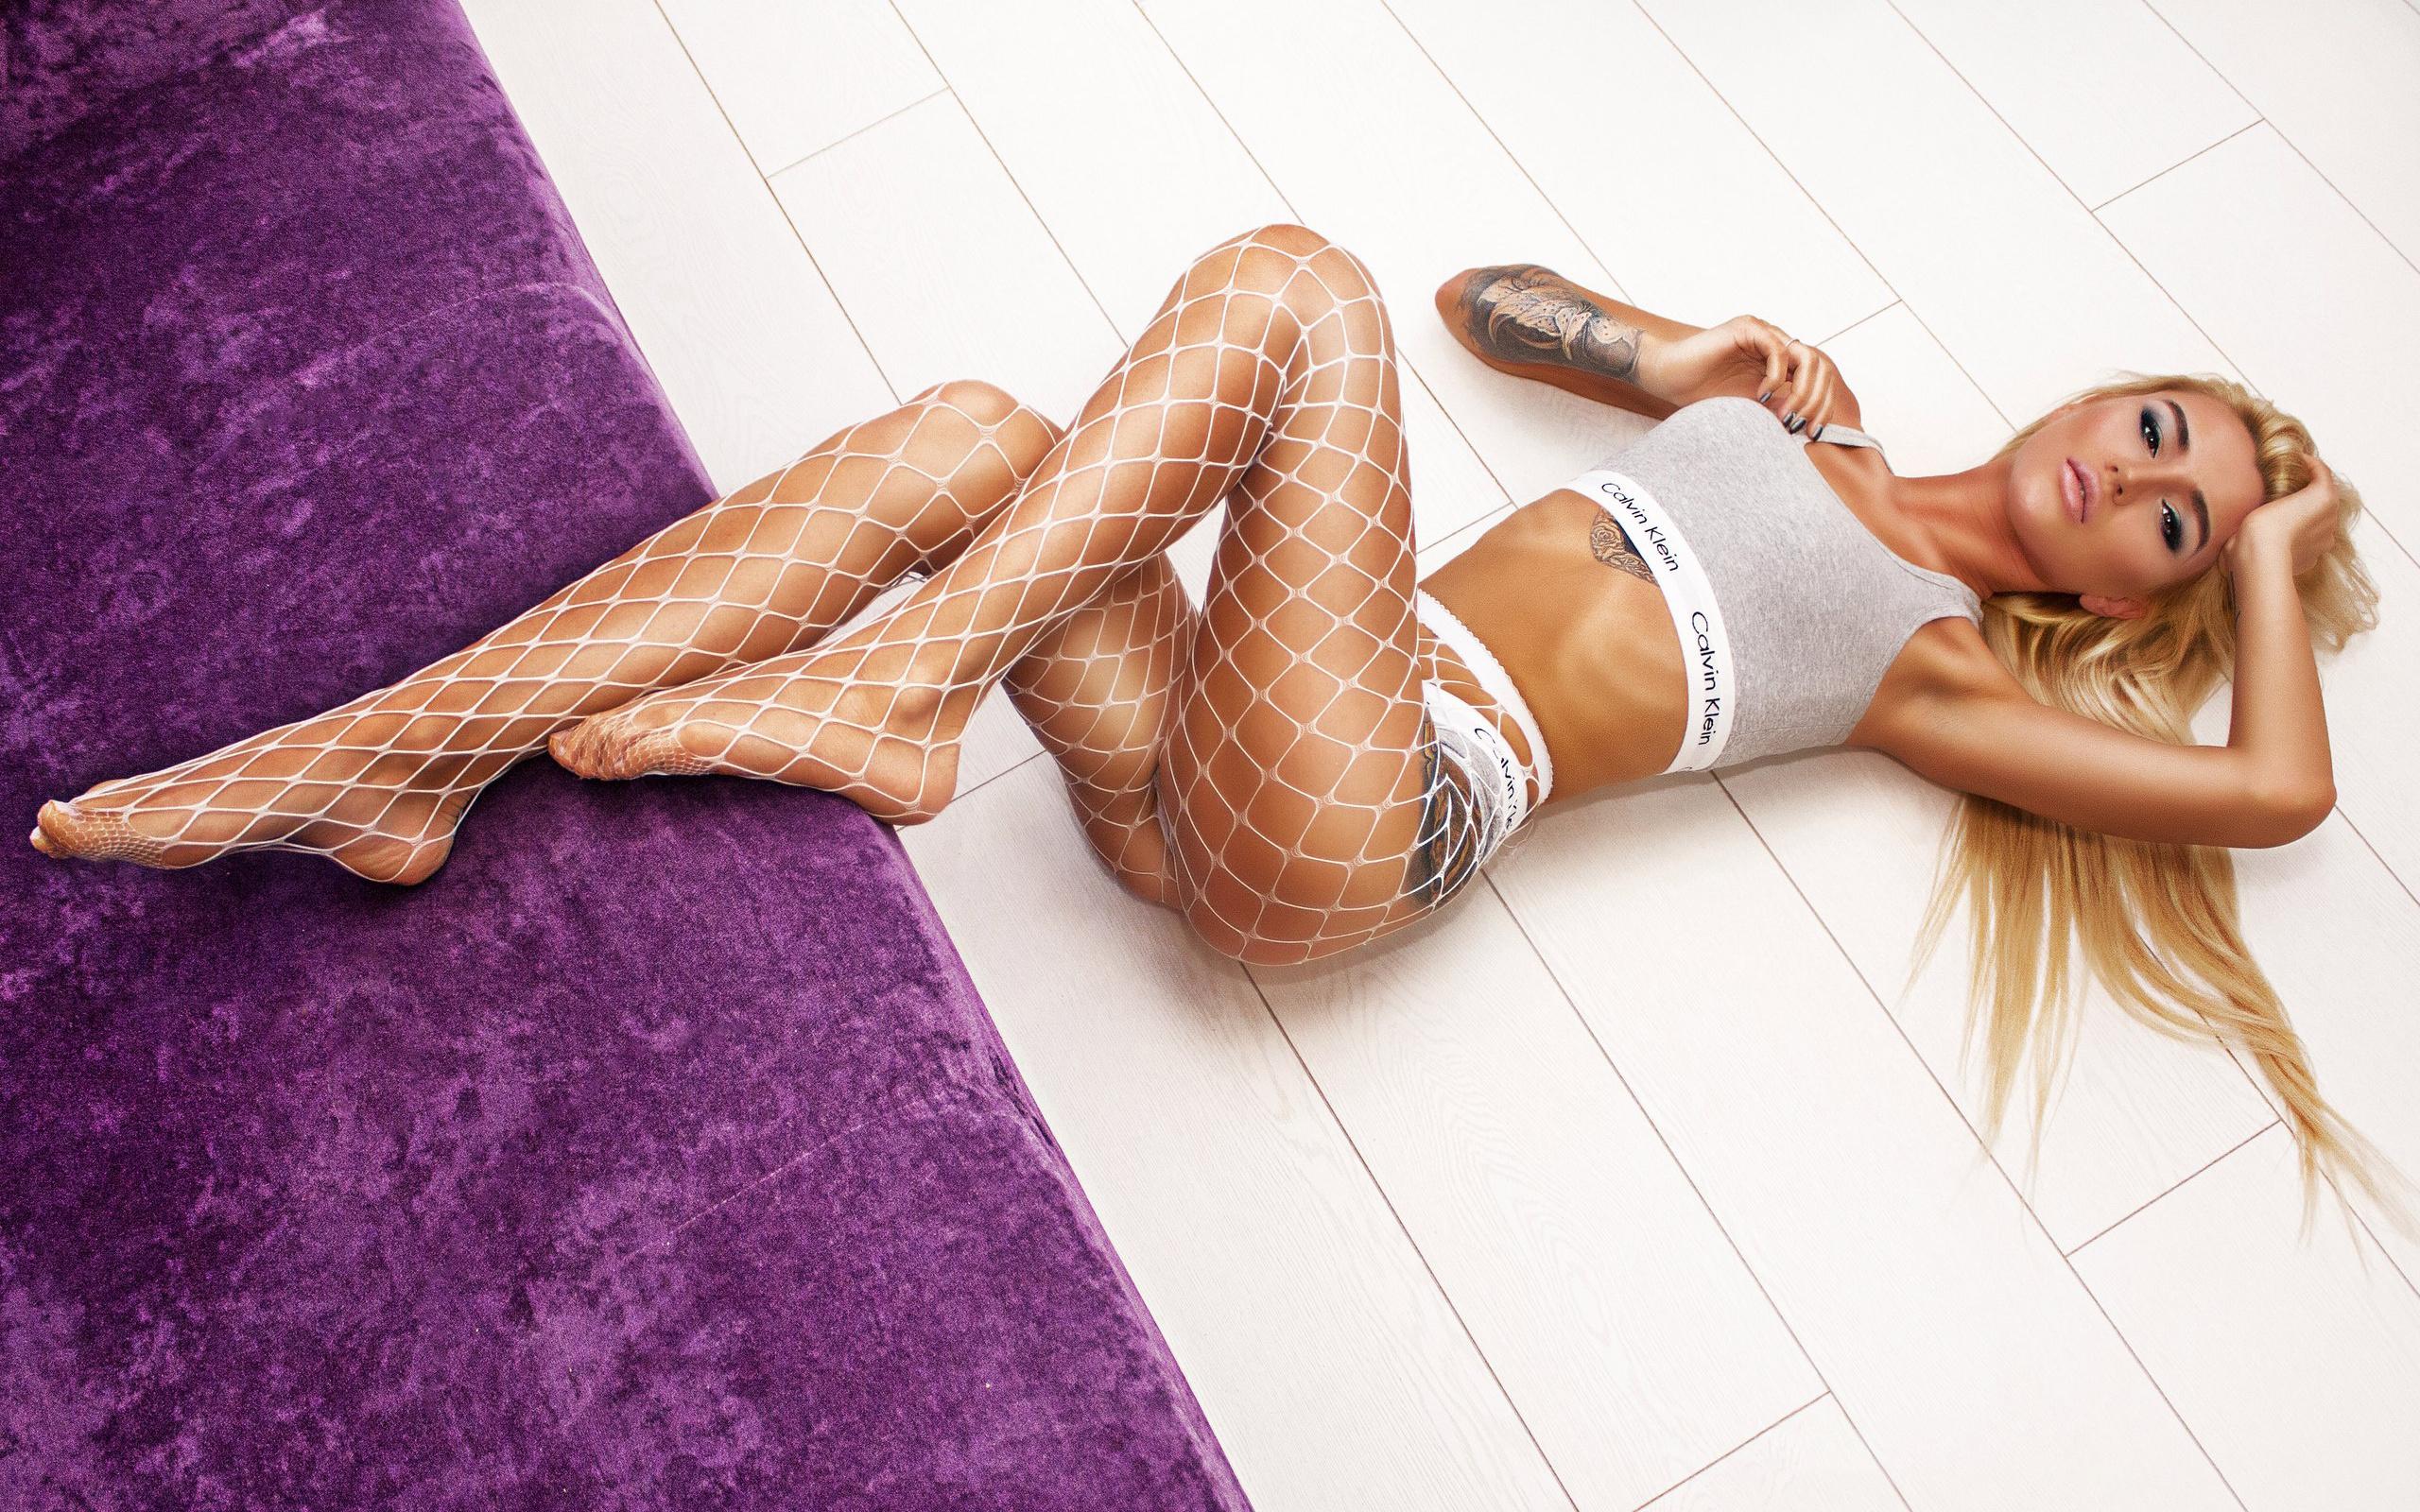 Блондинка сетка калкотка, модели без лифчиков в сарафане на голое тело